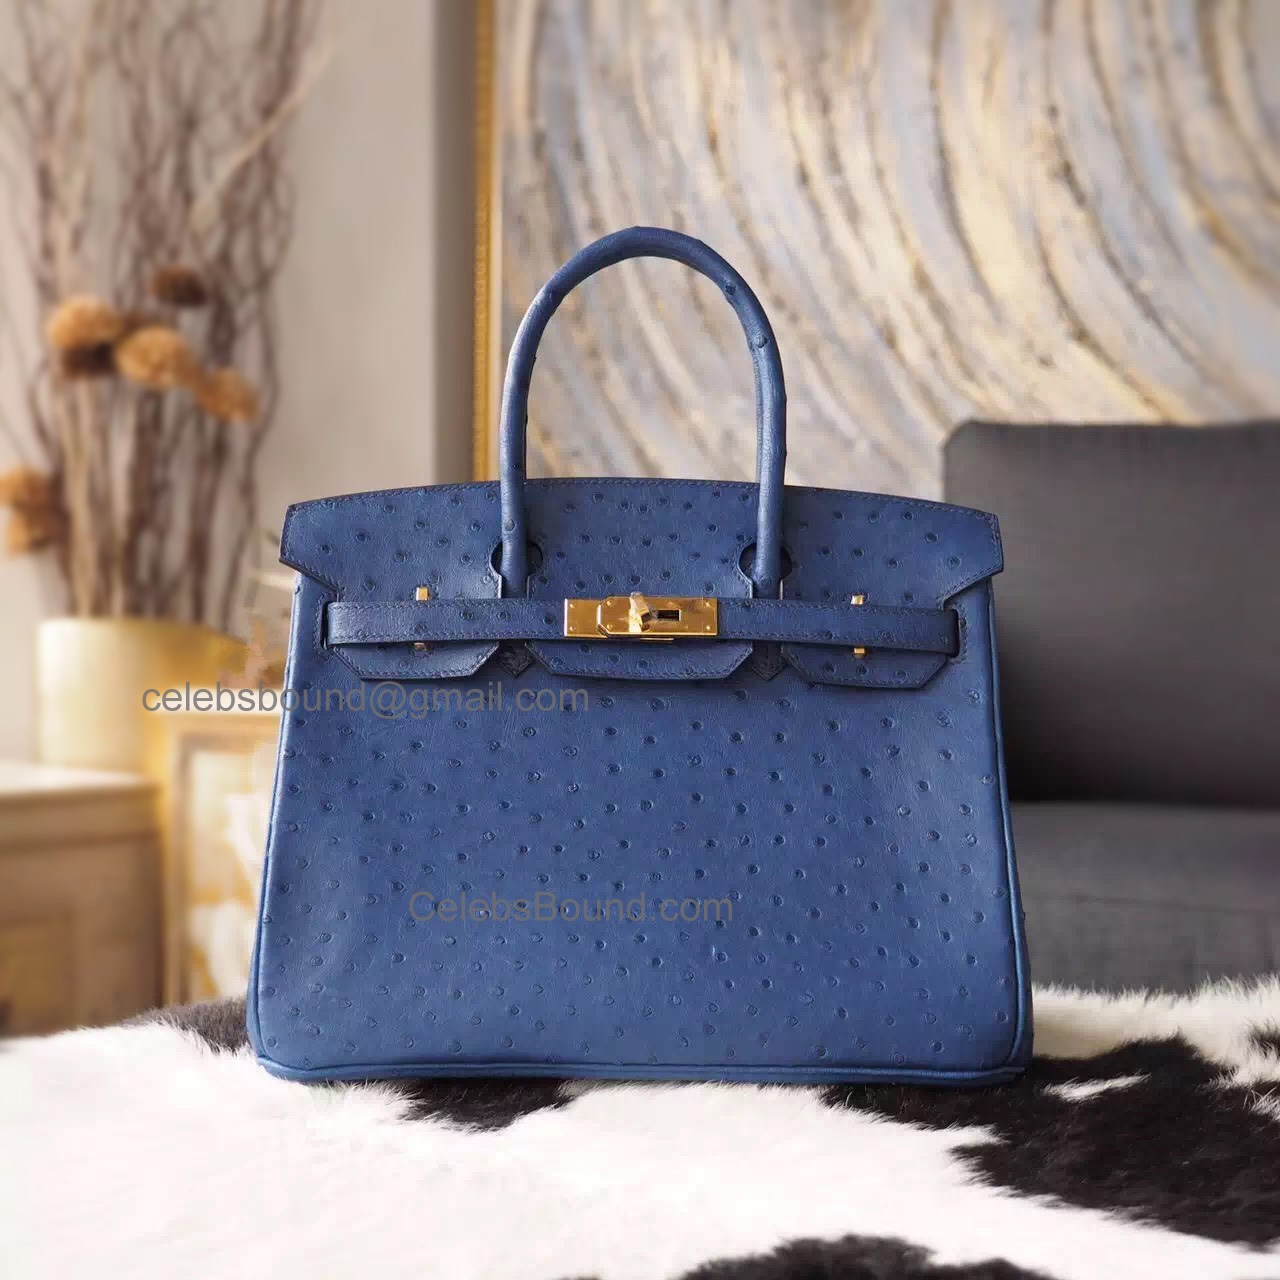 9af191b8718d Hand Stitched Hermes Birkin 30 Bag in 7L Blue Malte Ostrich GHW